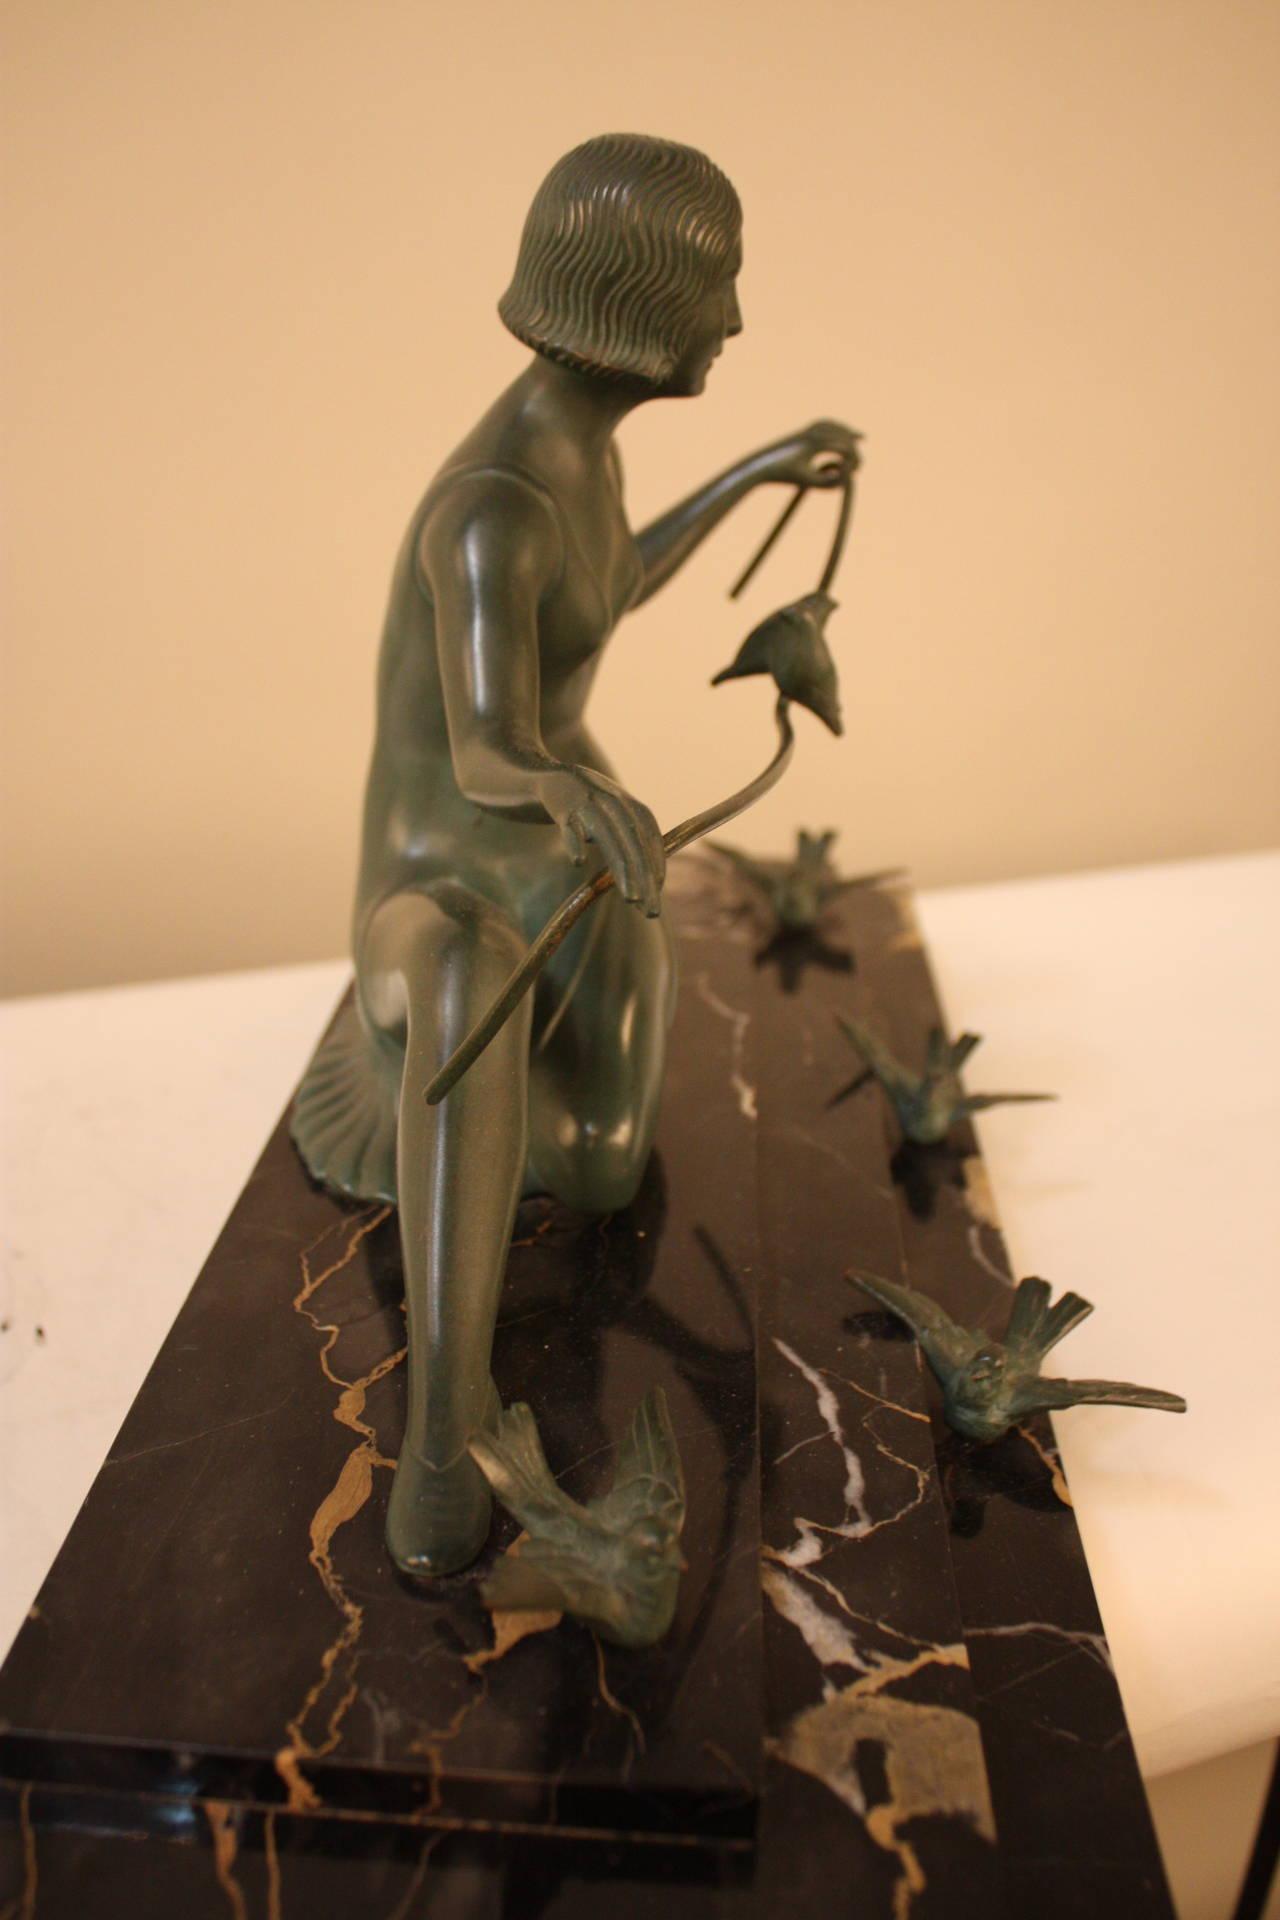 Art Deco Bronze Sculpture by Zoltan Kovats In Good Condition In Fairfax, VA